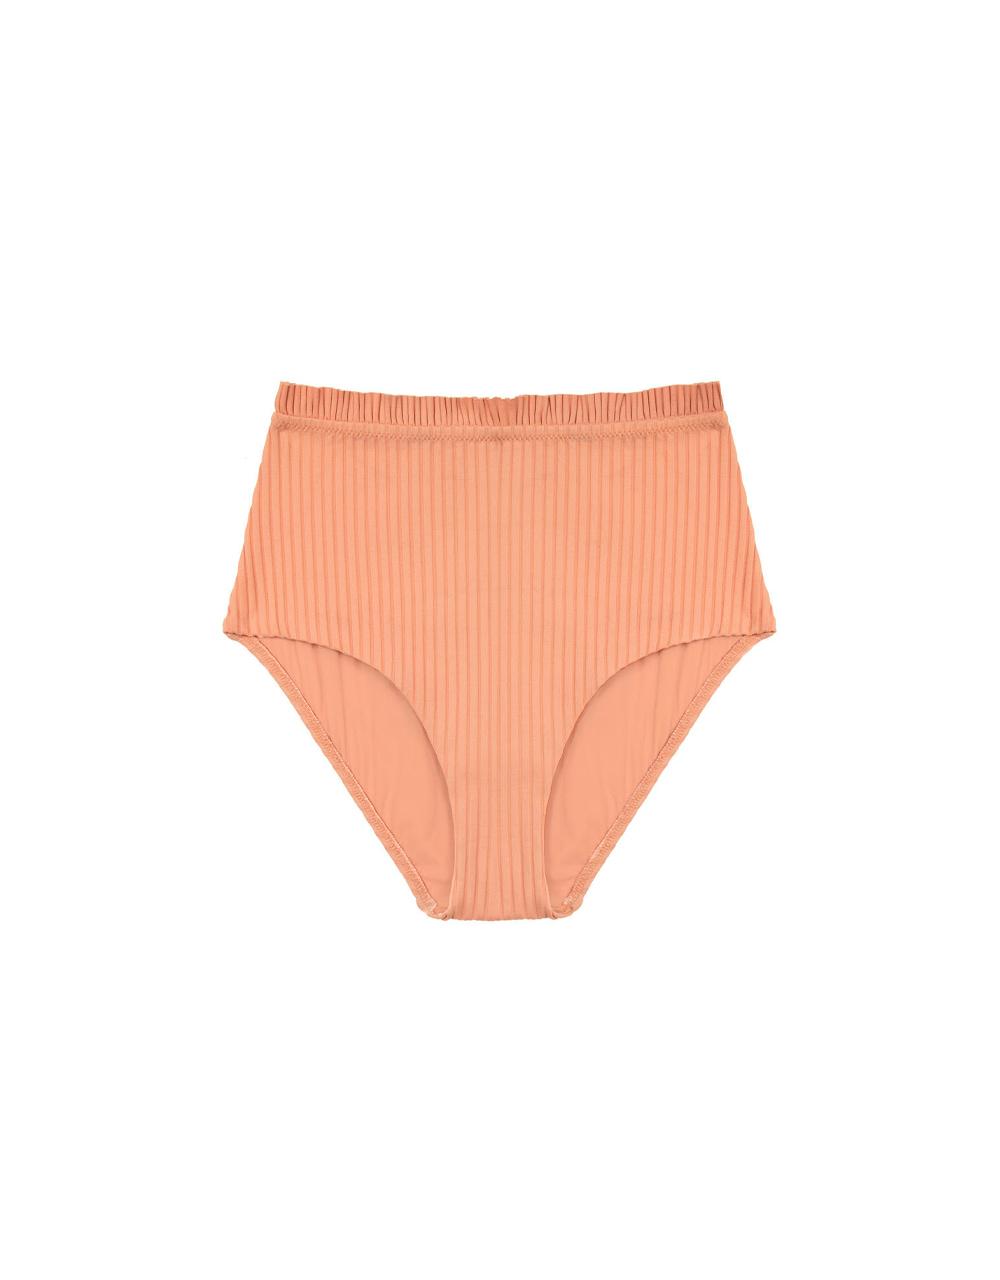 maillot de bain culotte taille haute South Abricot 30 € Girls In Paris photo 6